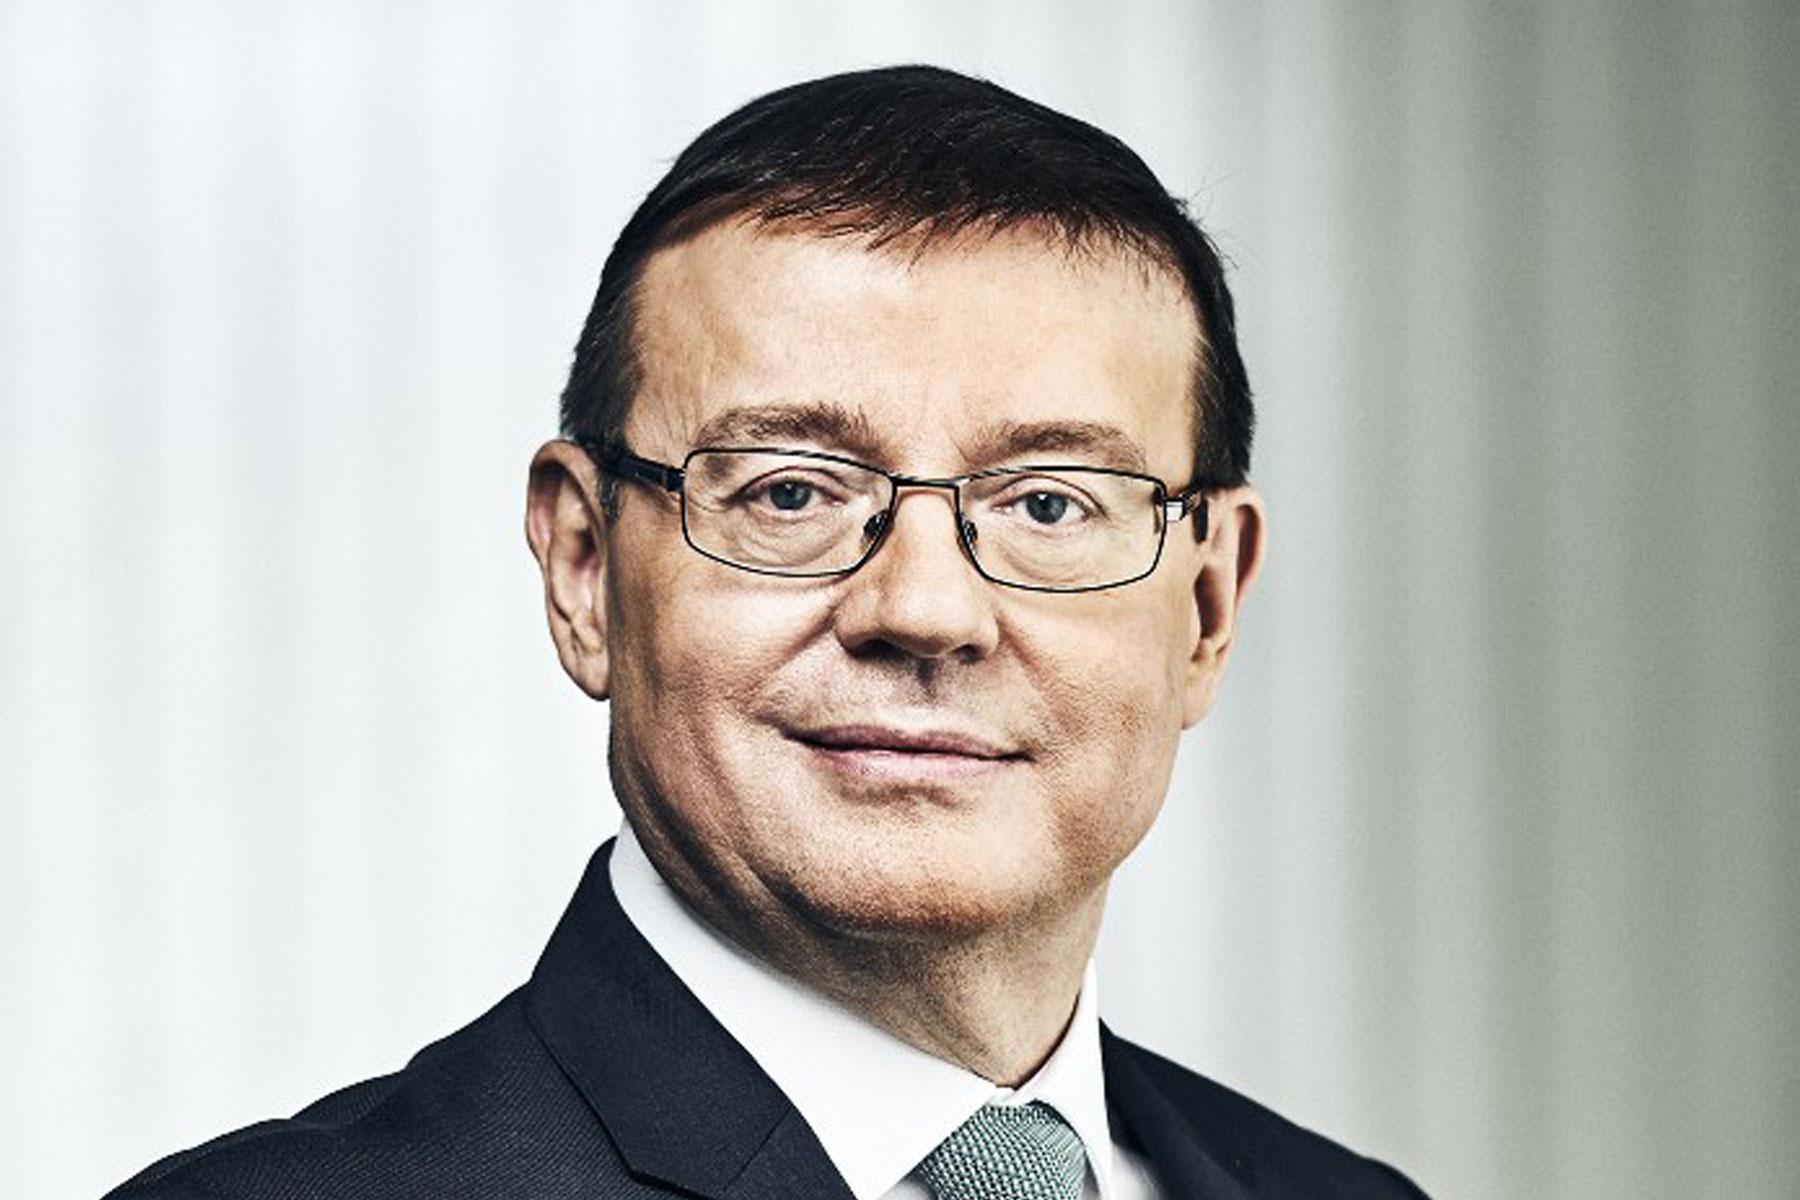 Photographic portrait of Bohdan Wojnar